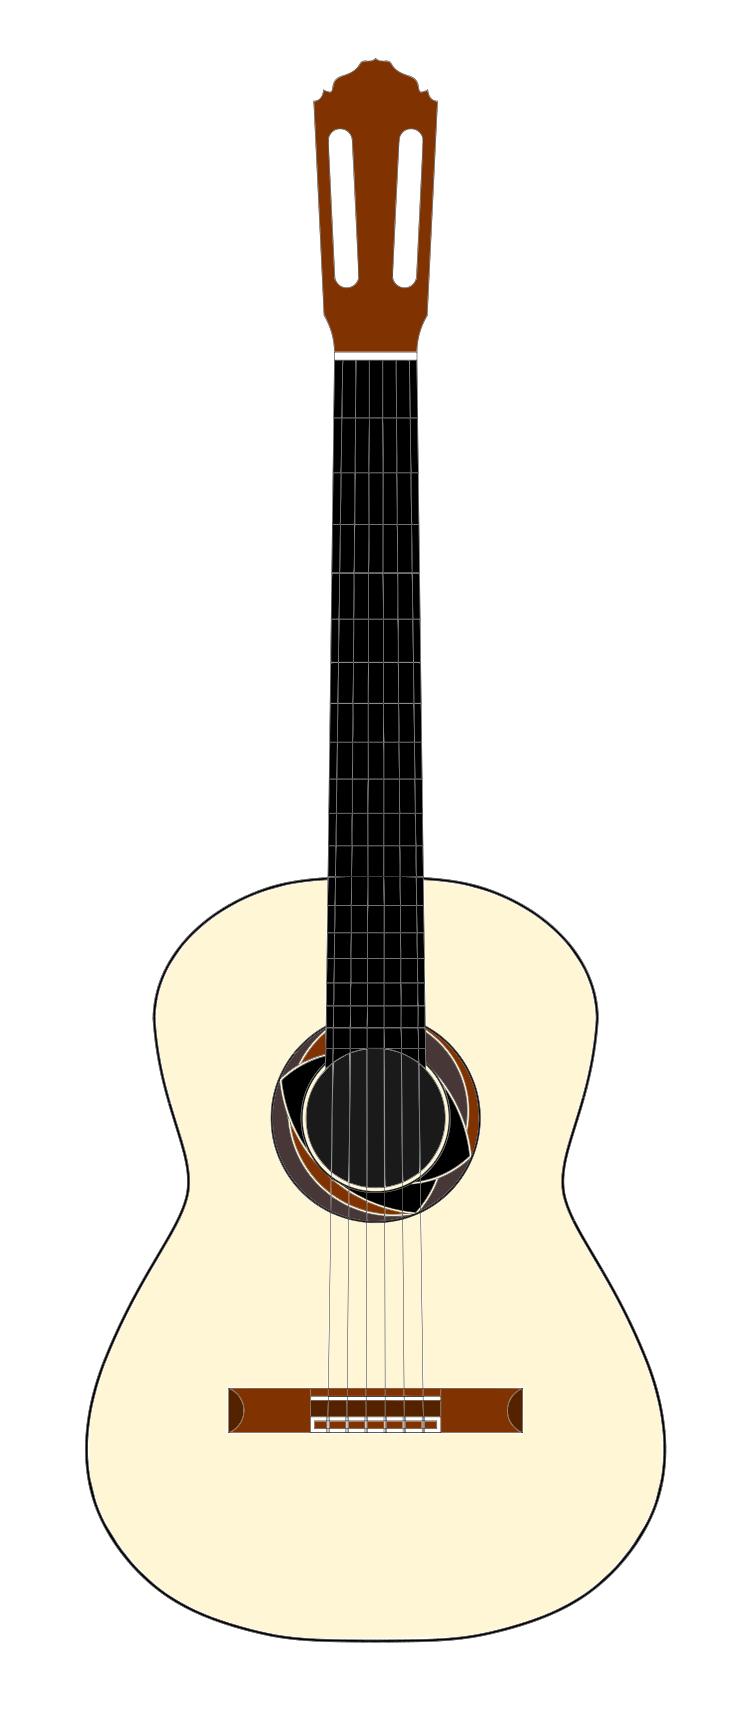 image guitare2-v1.png